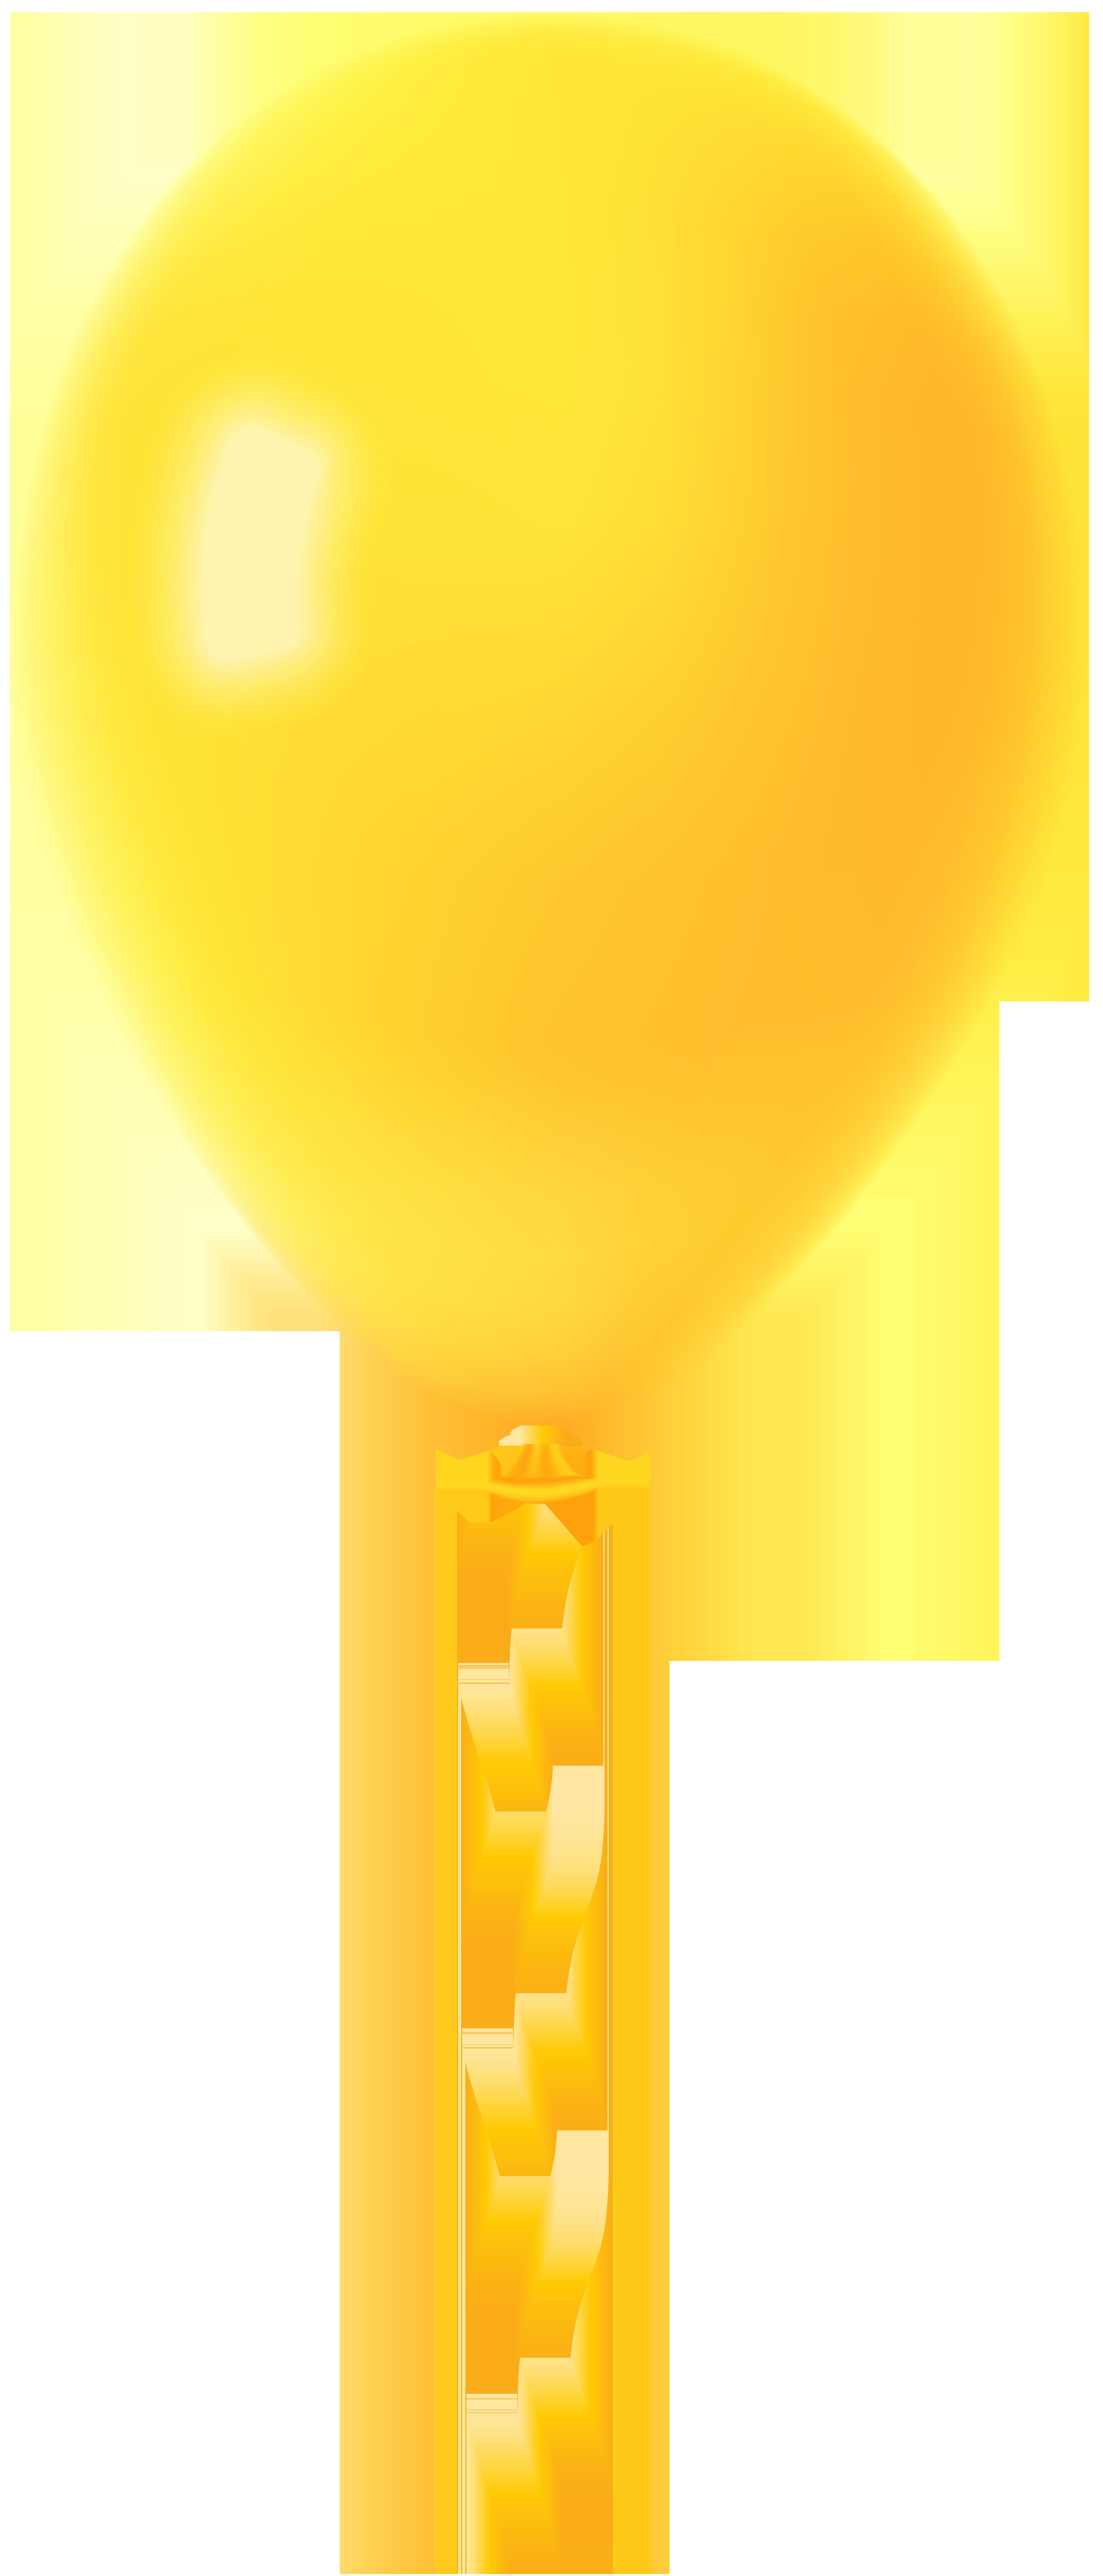 Clipart balloon yellow. Transparent png clip art